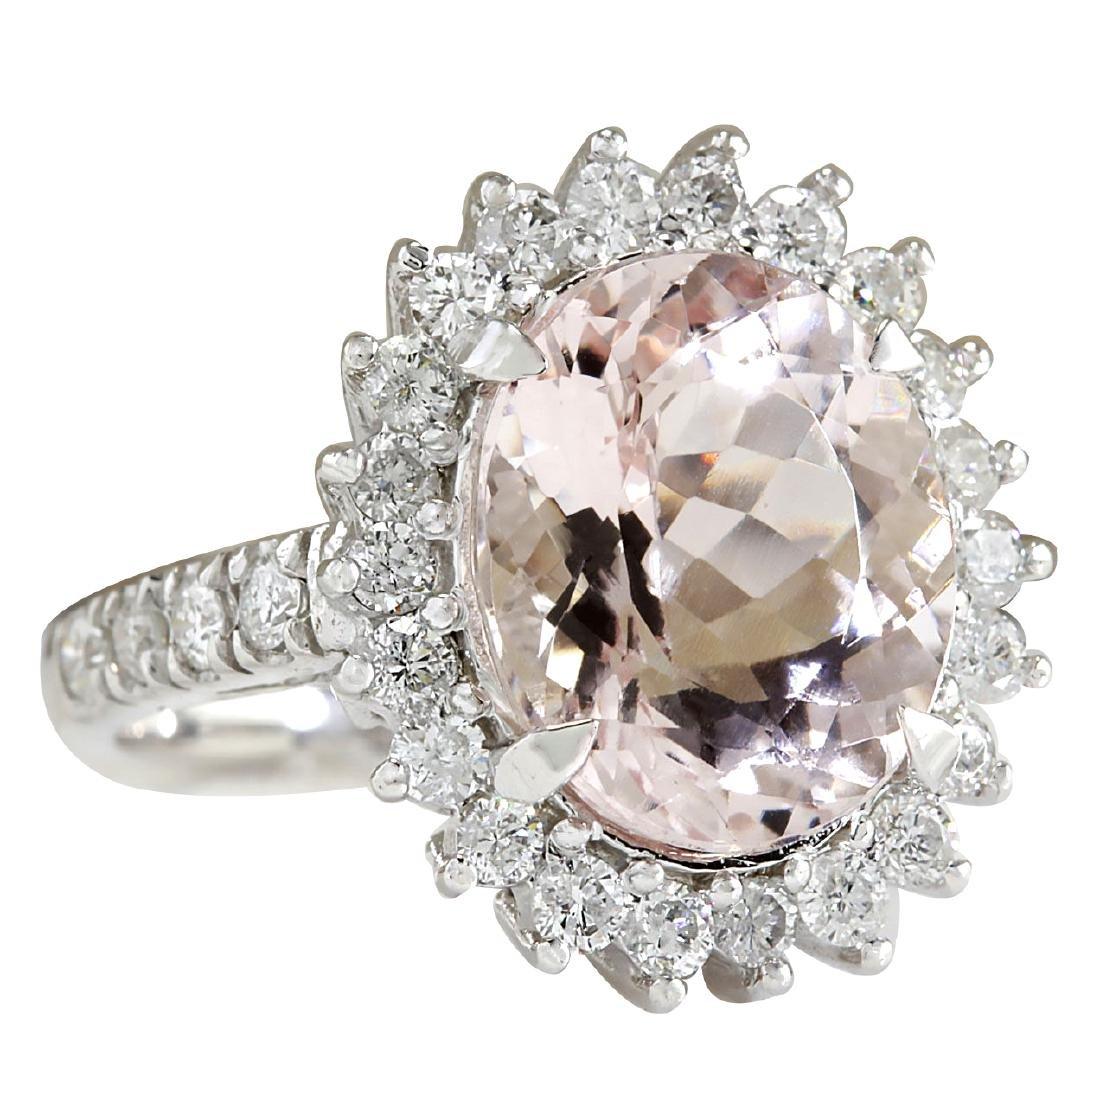 7.34CTW Natural Morganite And Diamond Ring In 18K White - 2